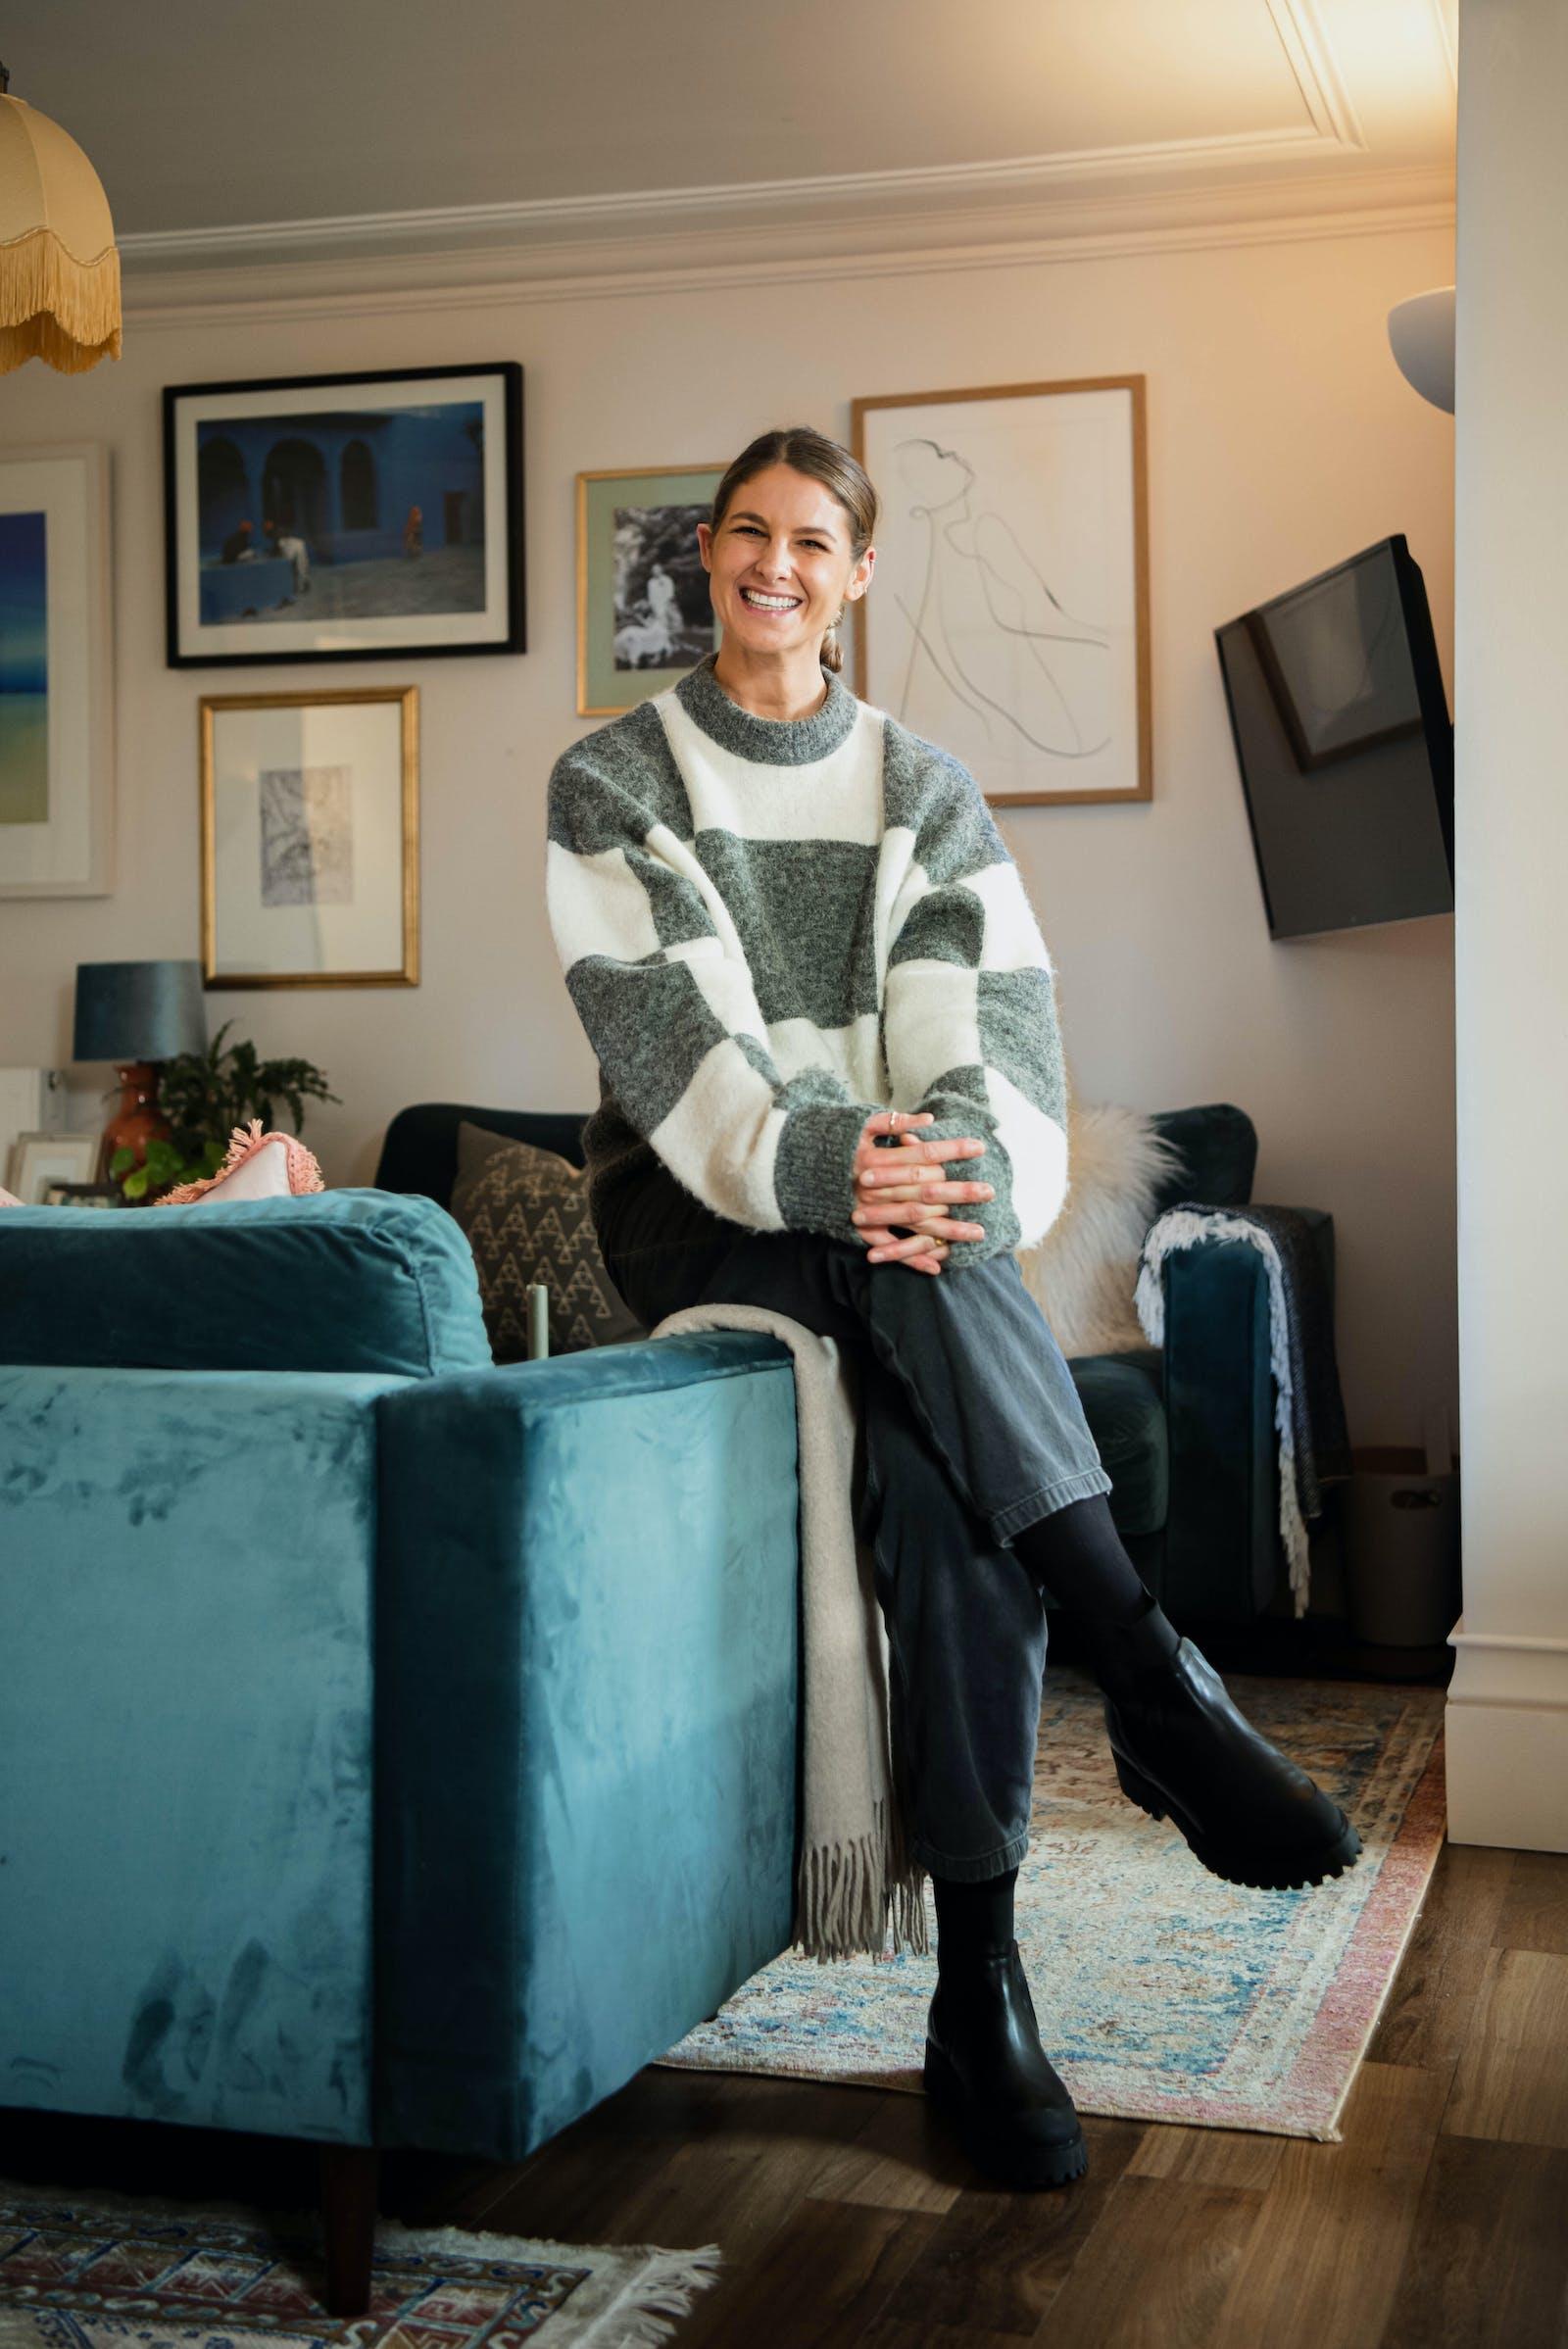 Natasha Bradley smiling and sitting on couch